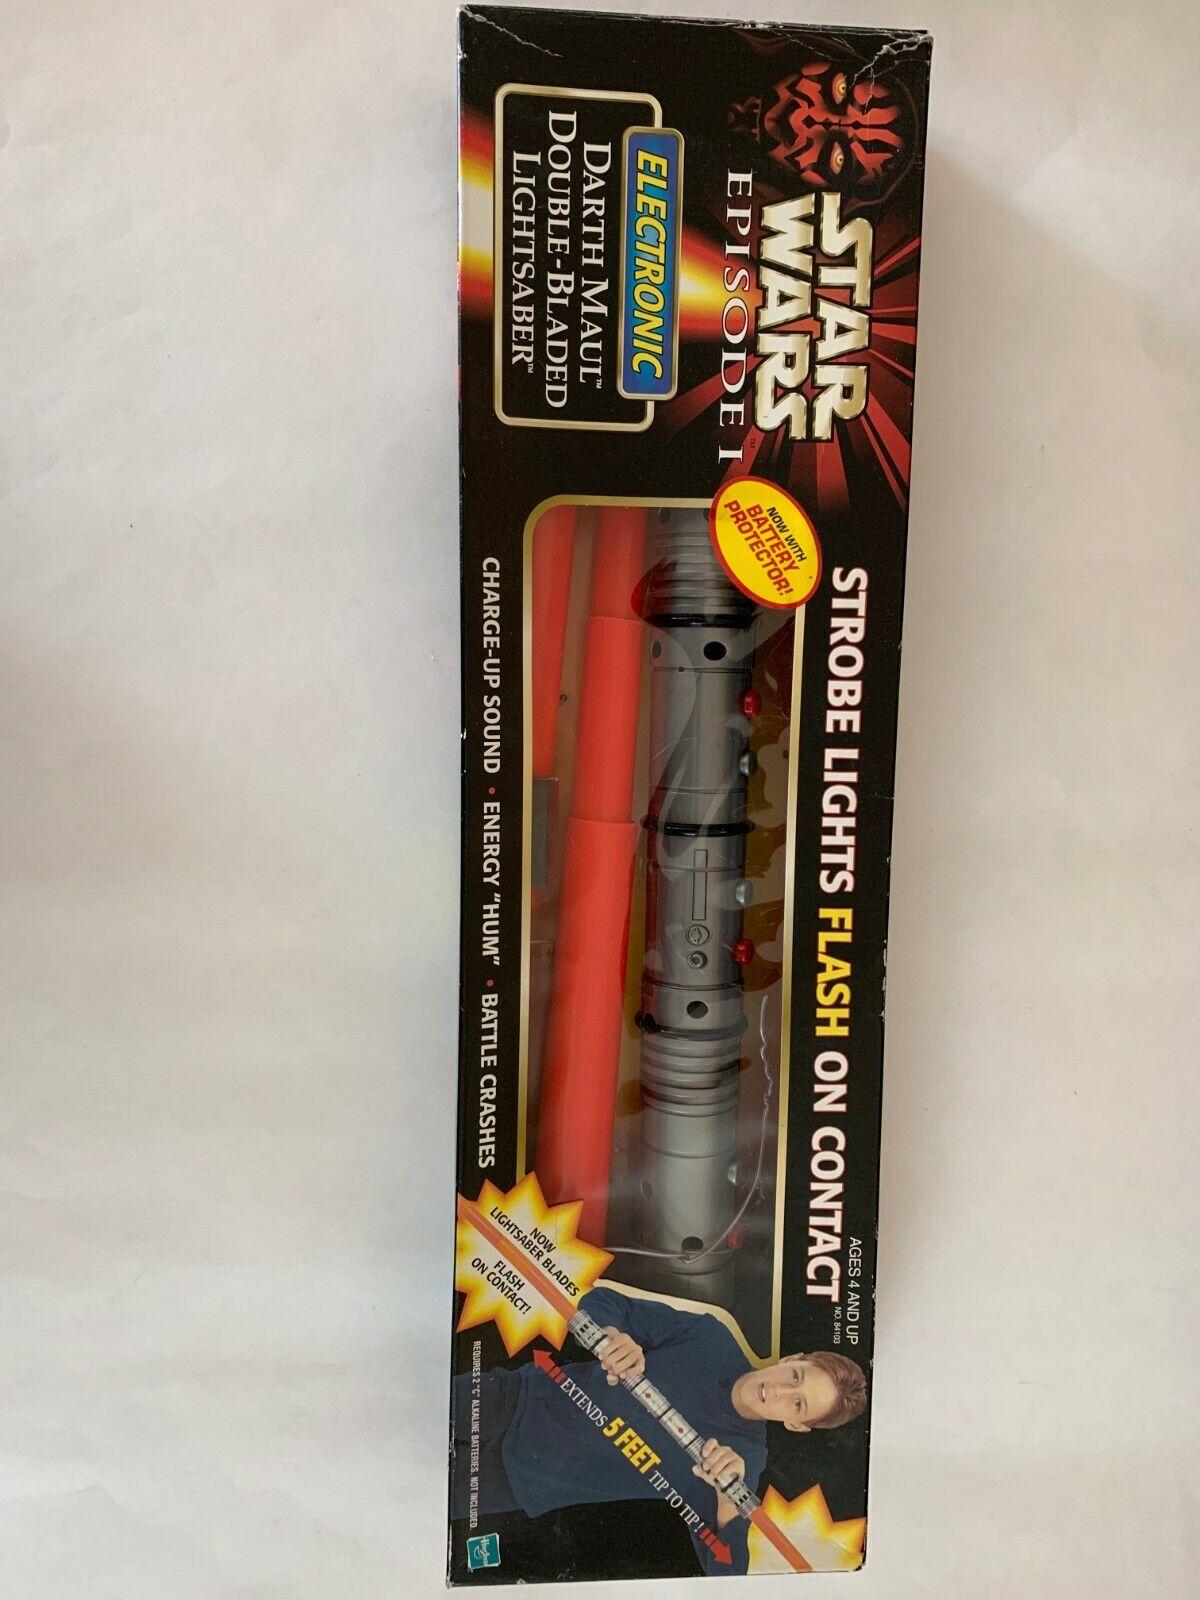 Star Wars Episode 1 1998 1998 1998 Darth Maul Double Bladed Light Saber (Hasbro) 202486